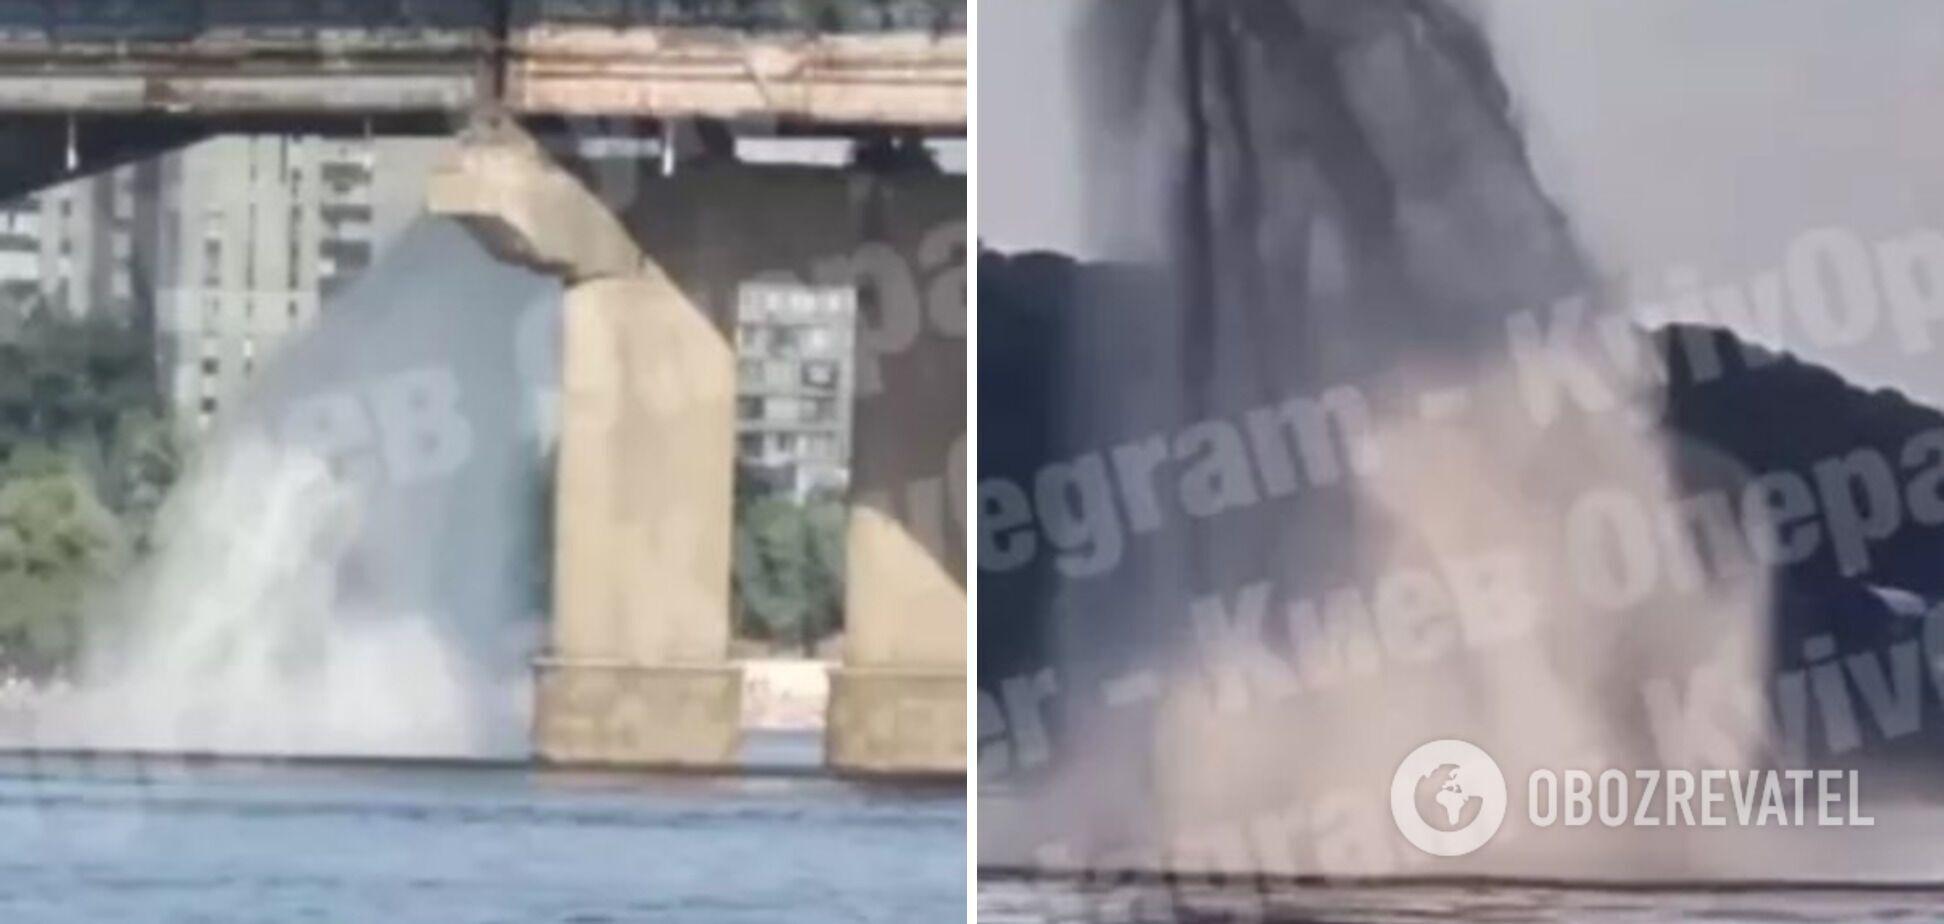 Прорив труби на мосту Патона 11 липня